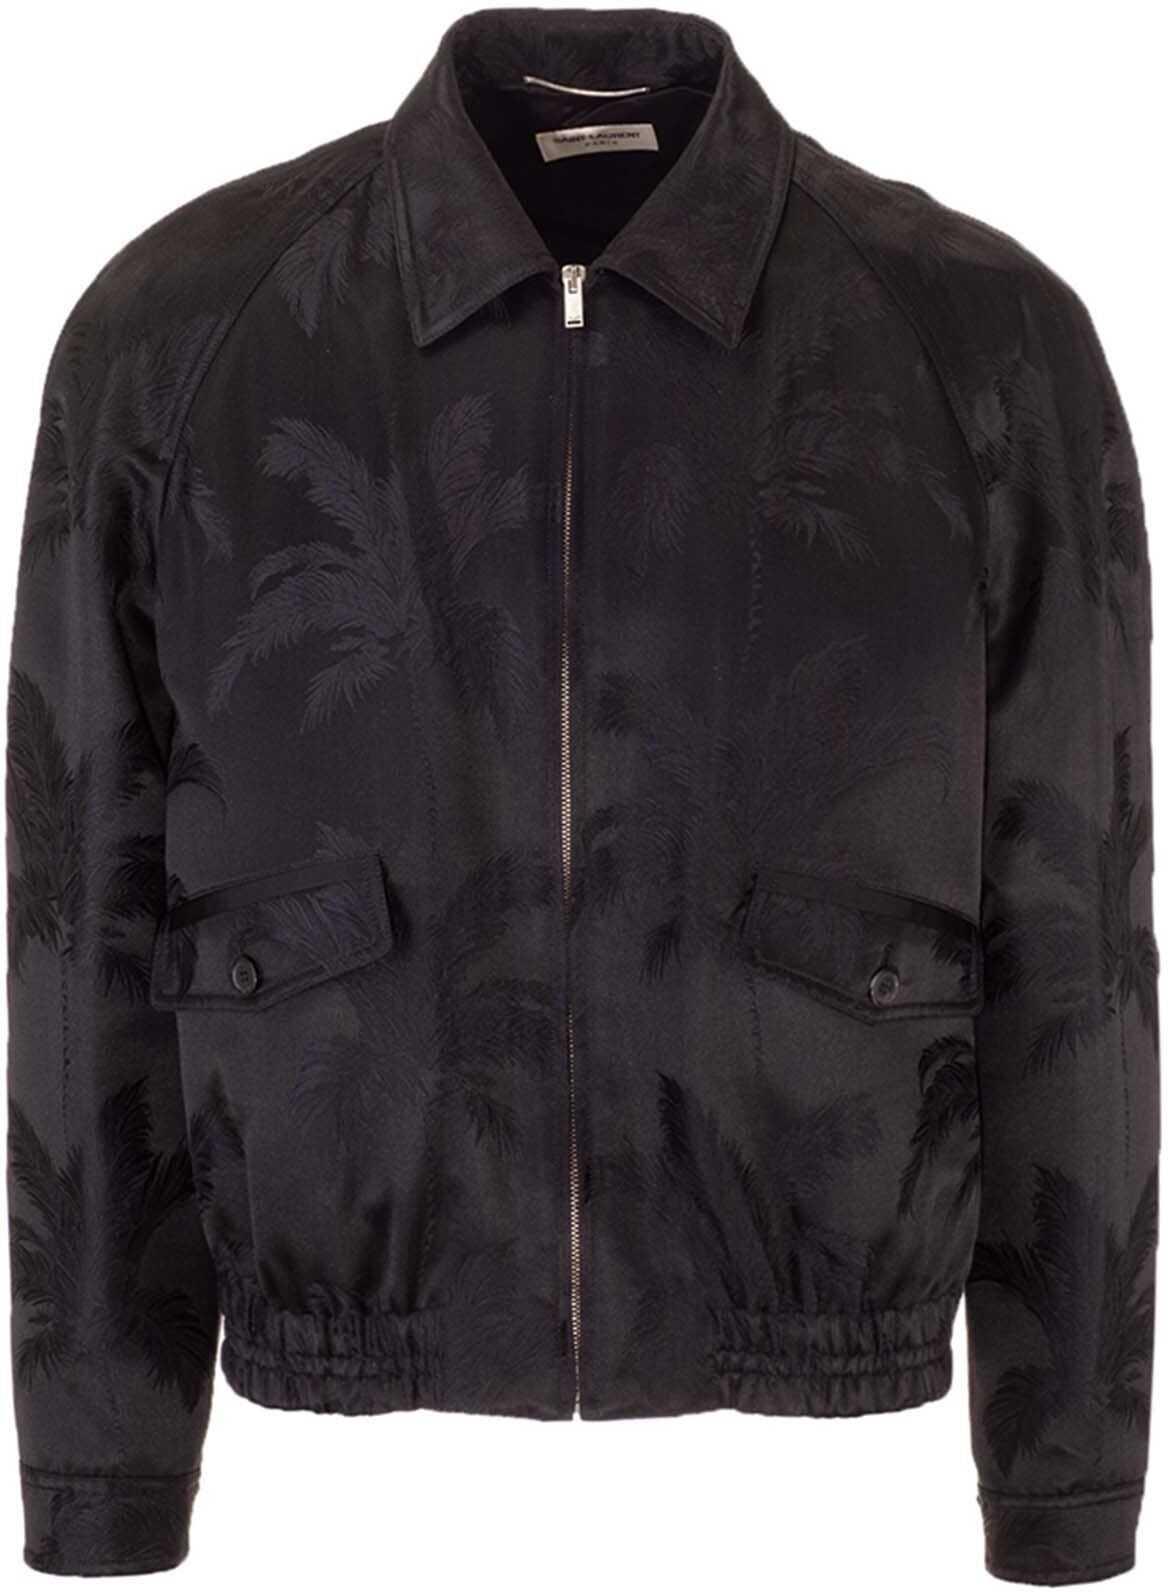 Saint Laurent Jacquard Satin Jacket In Black Black imagine